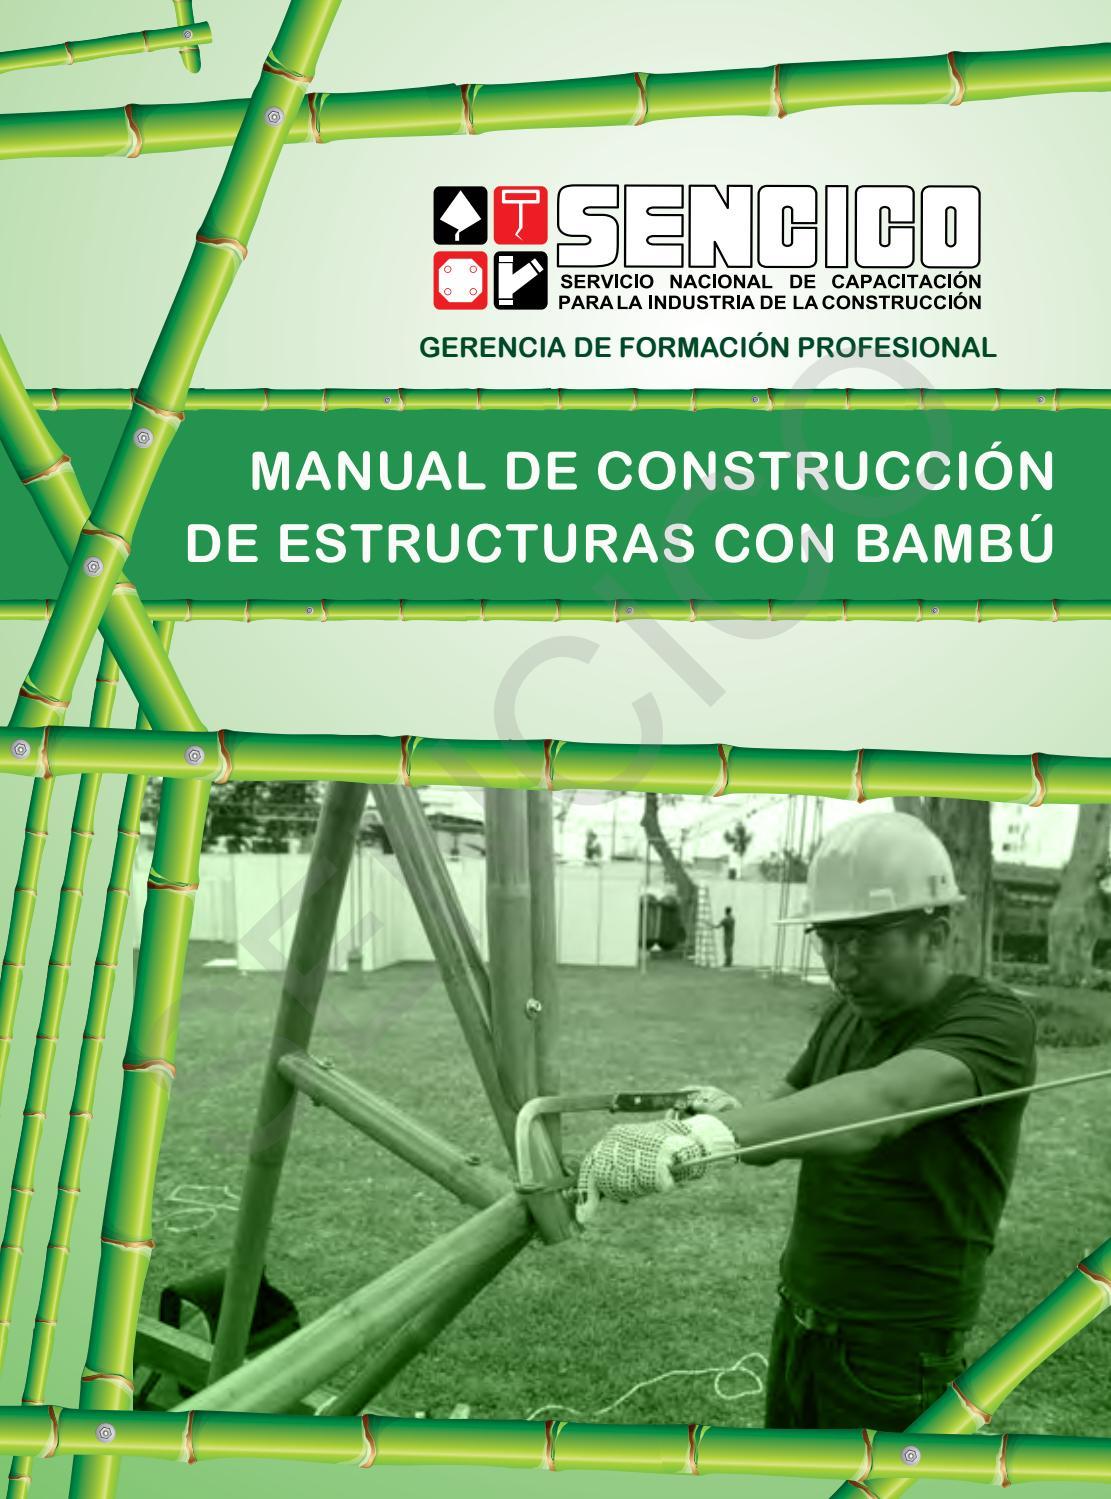 Manual de construcci n de estructuras de bamb by george for Manual de construccion